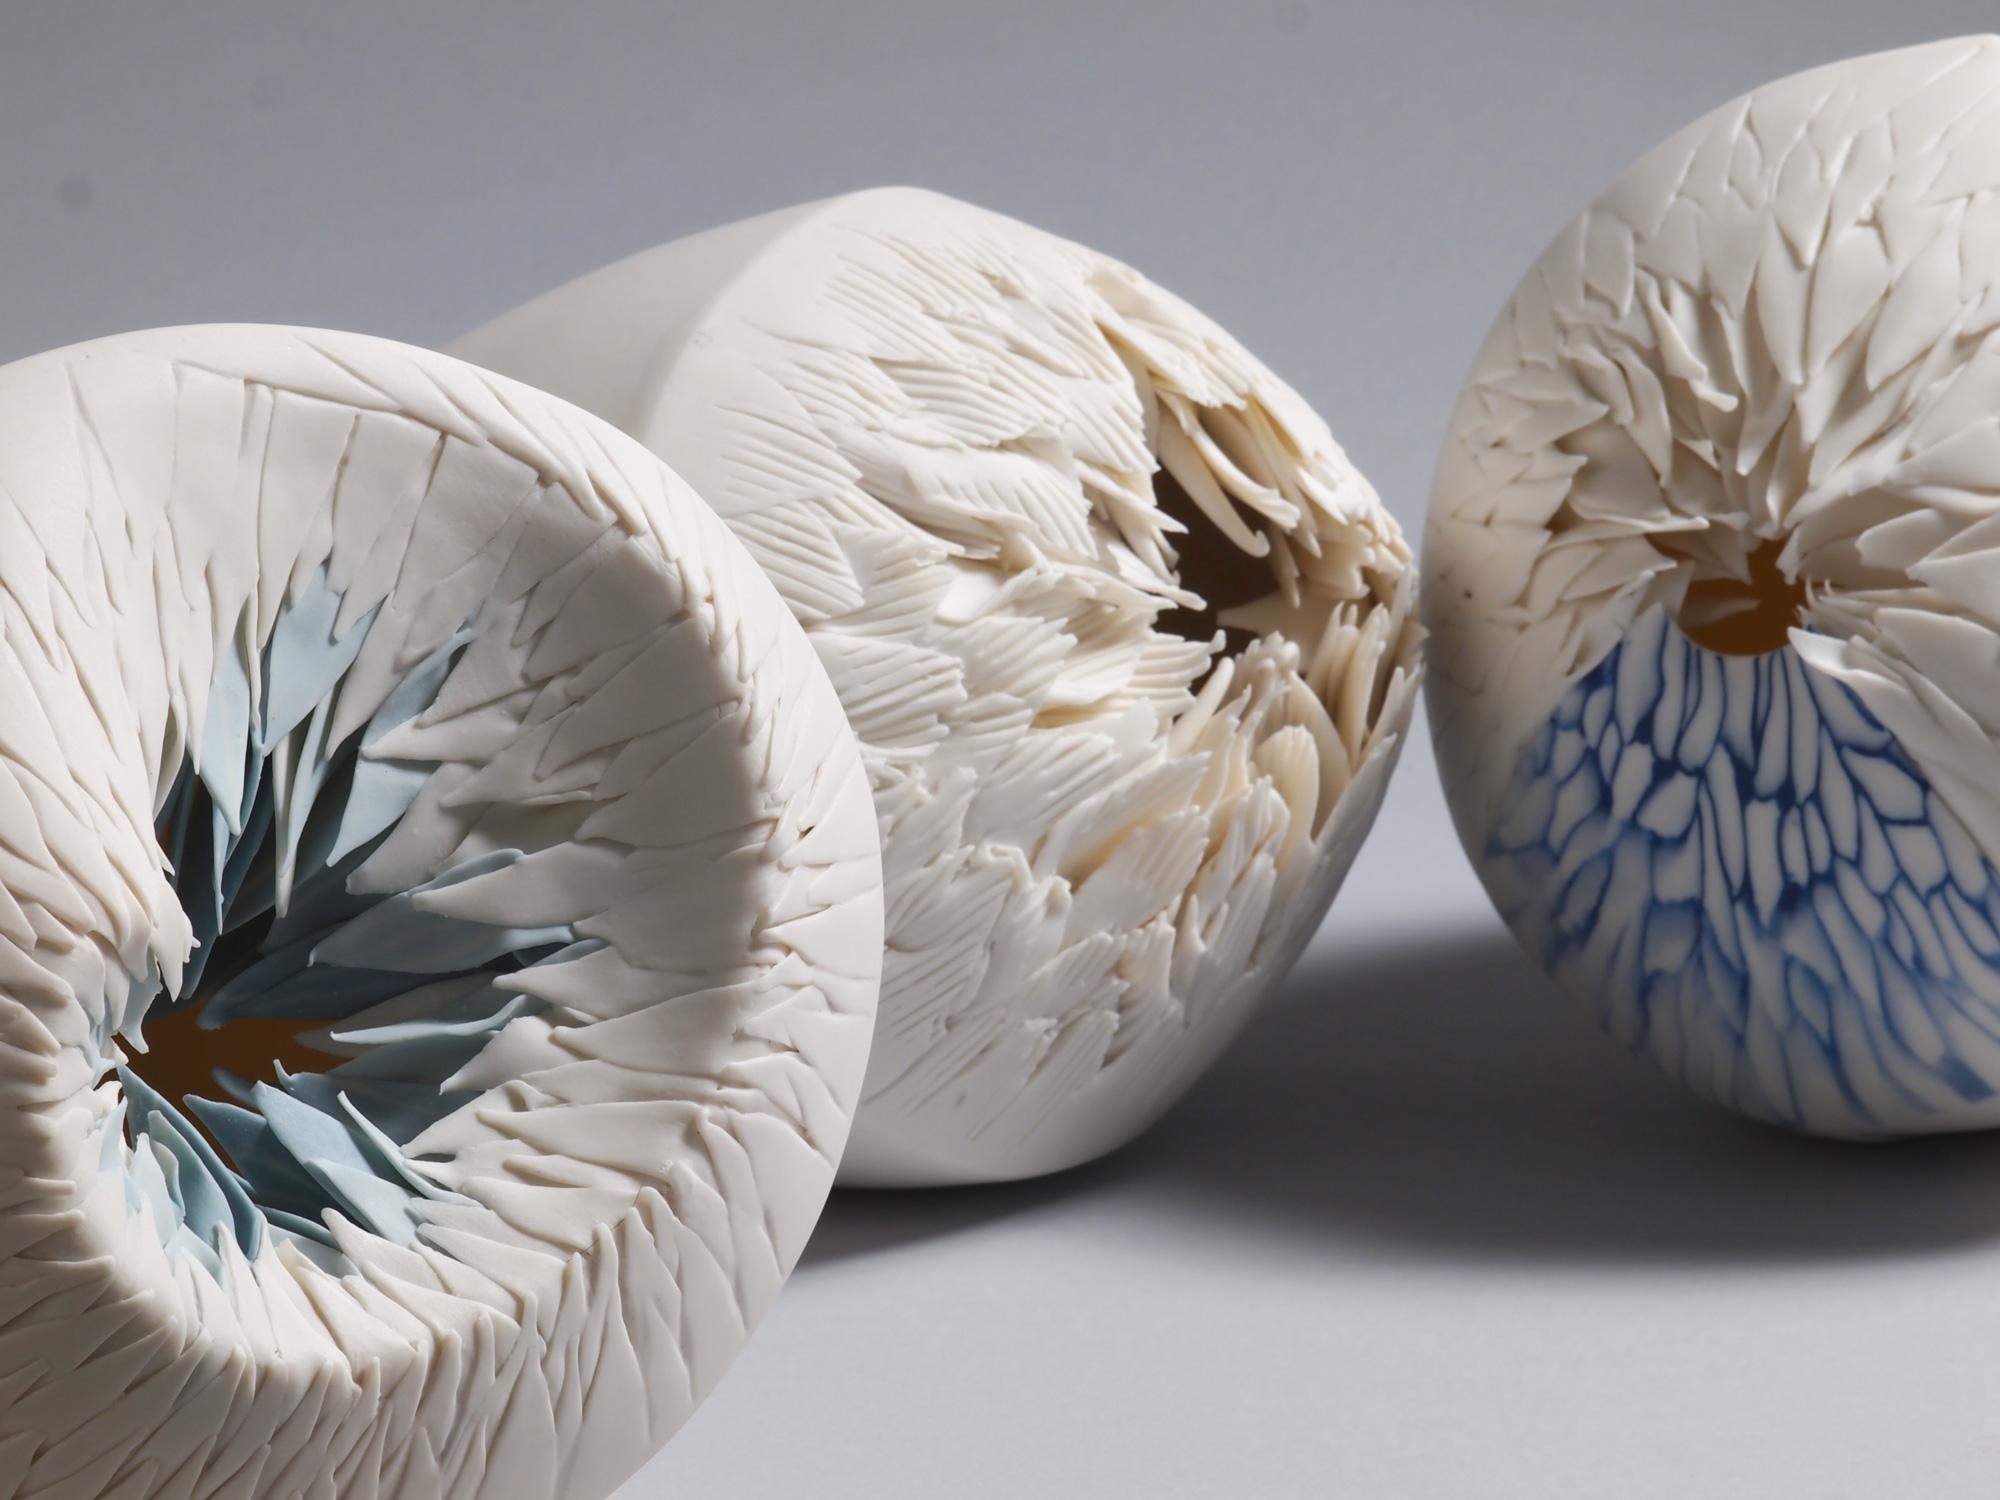 Sharp-Edged Porcelain Vessels by Martha Pachón Rodríguez